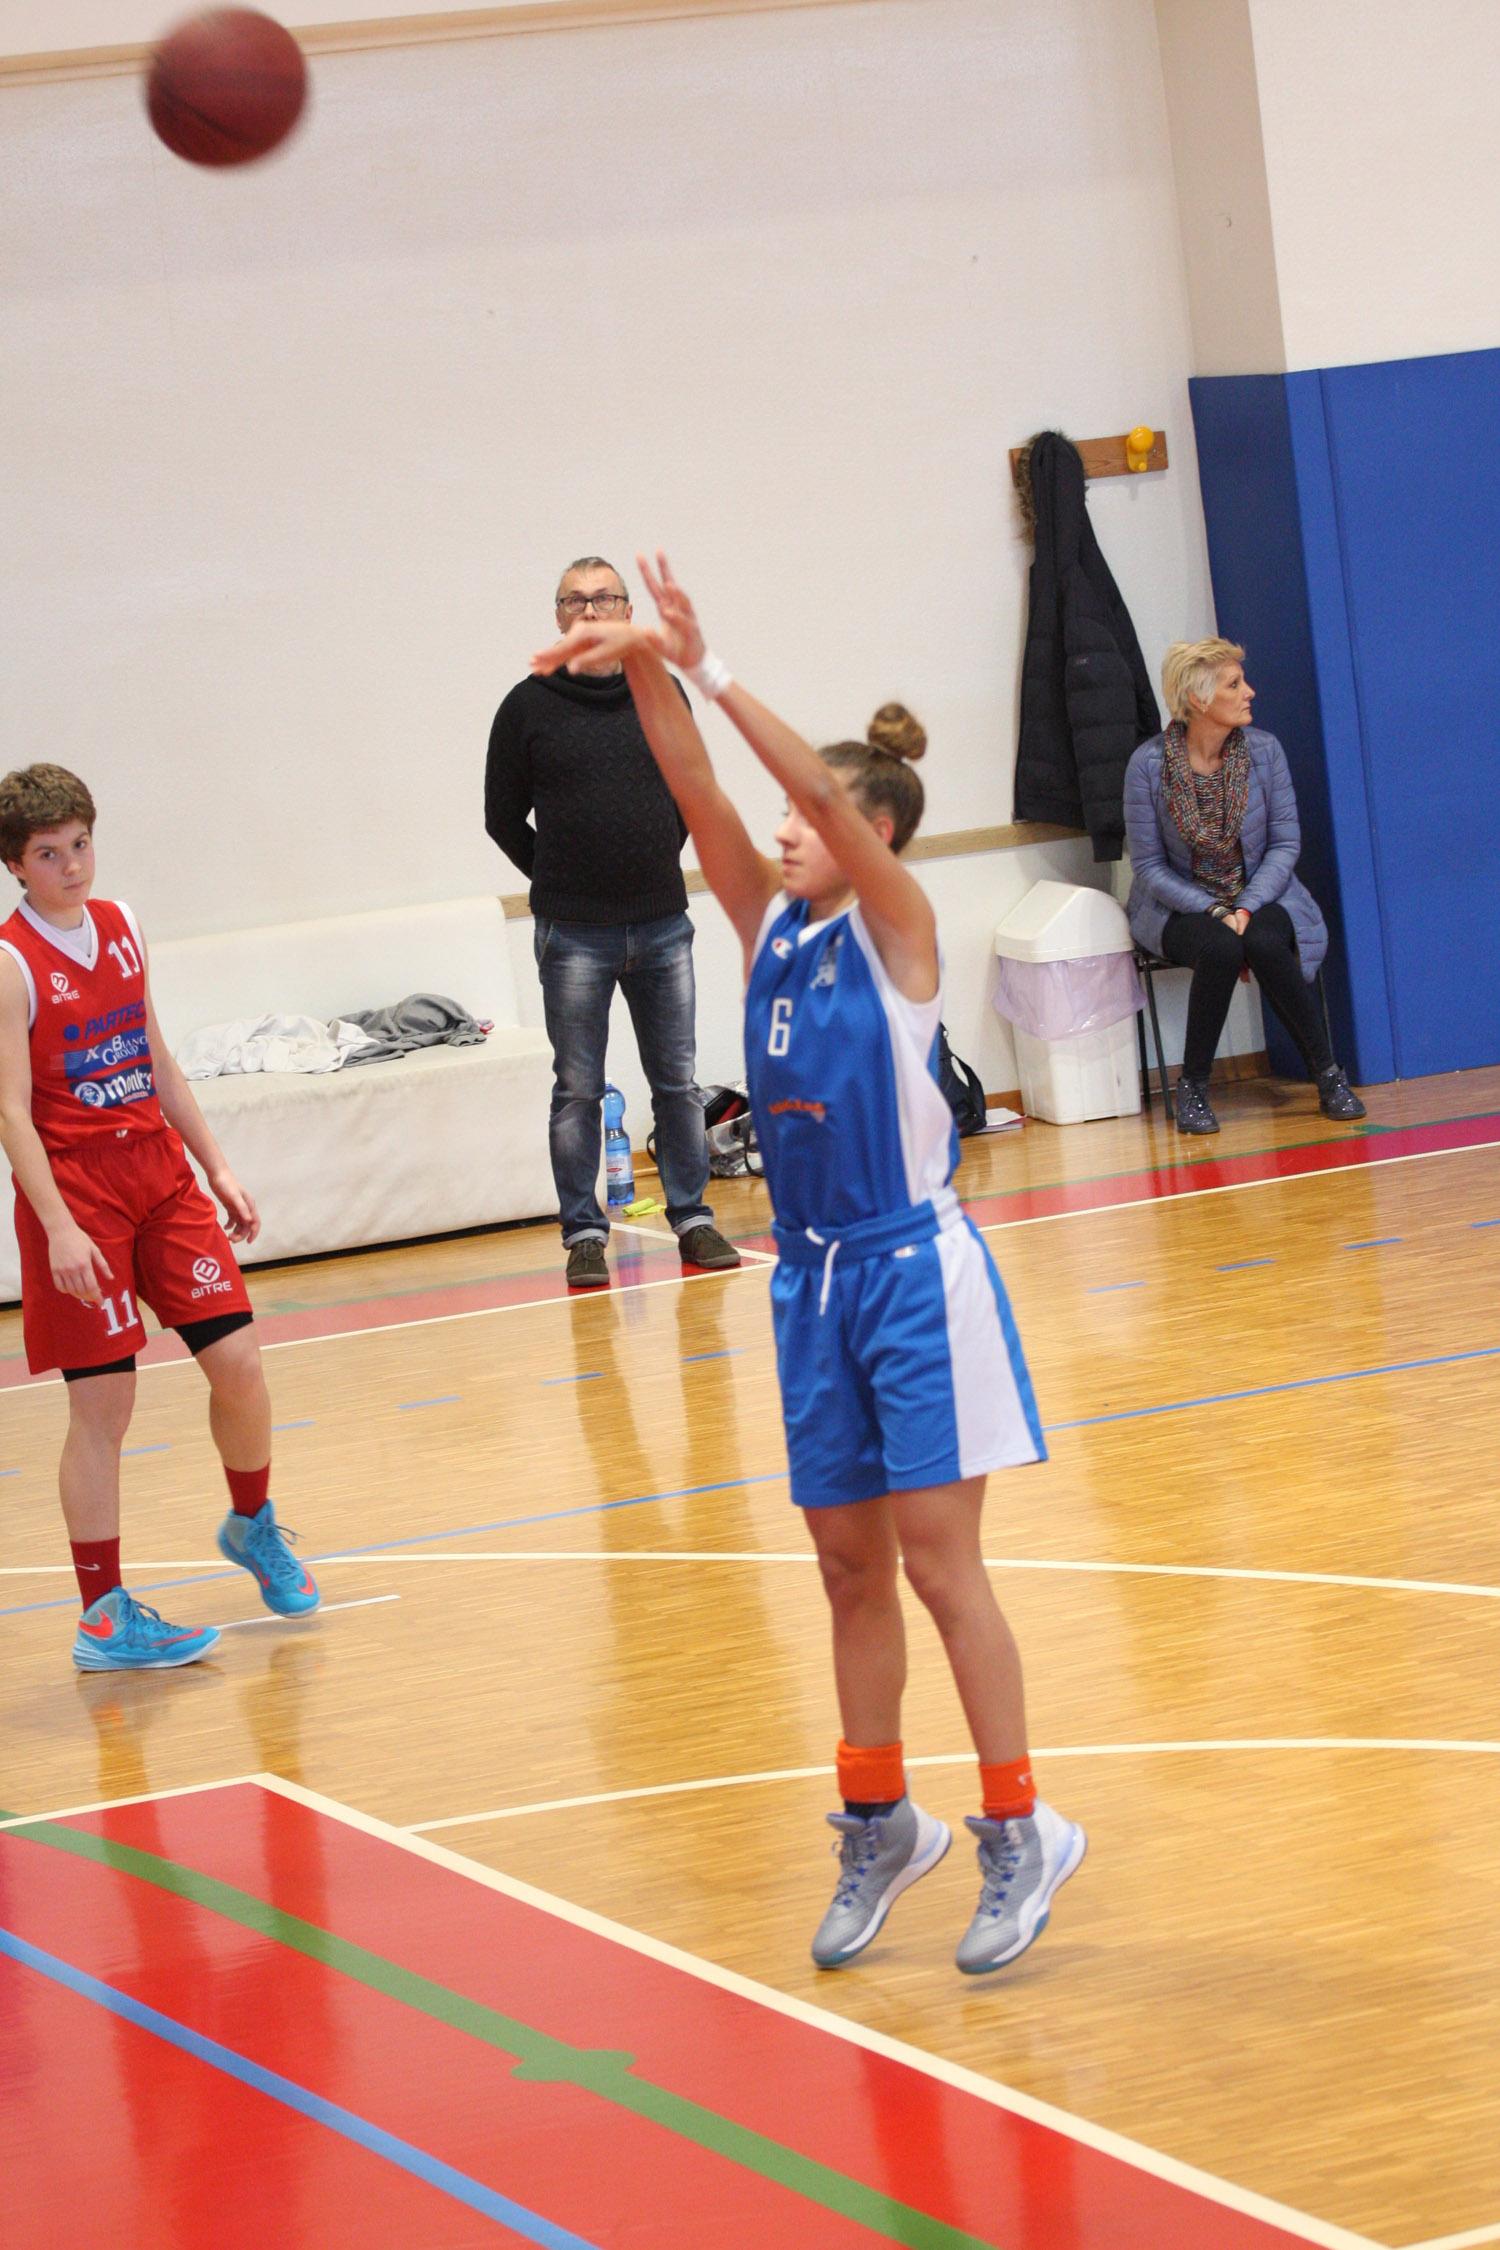 U16E - Costa Masnaga vs Baskettiamo Vittuone 2001 00011.jpg